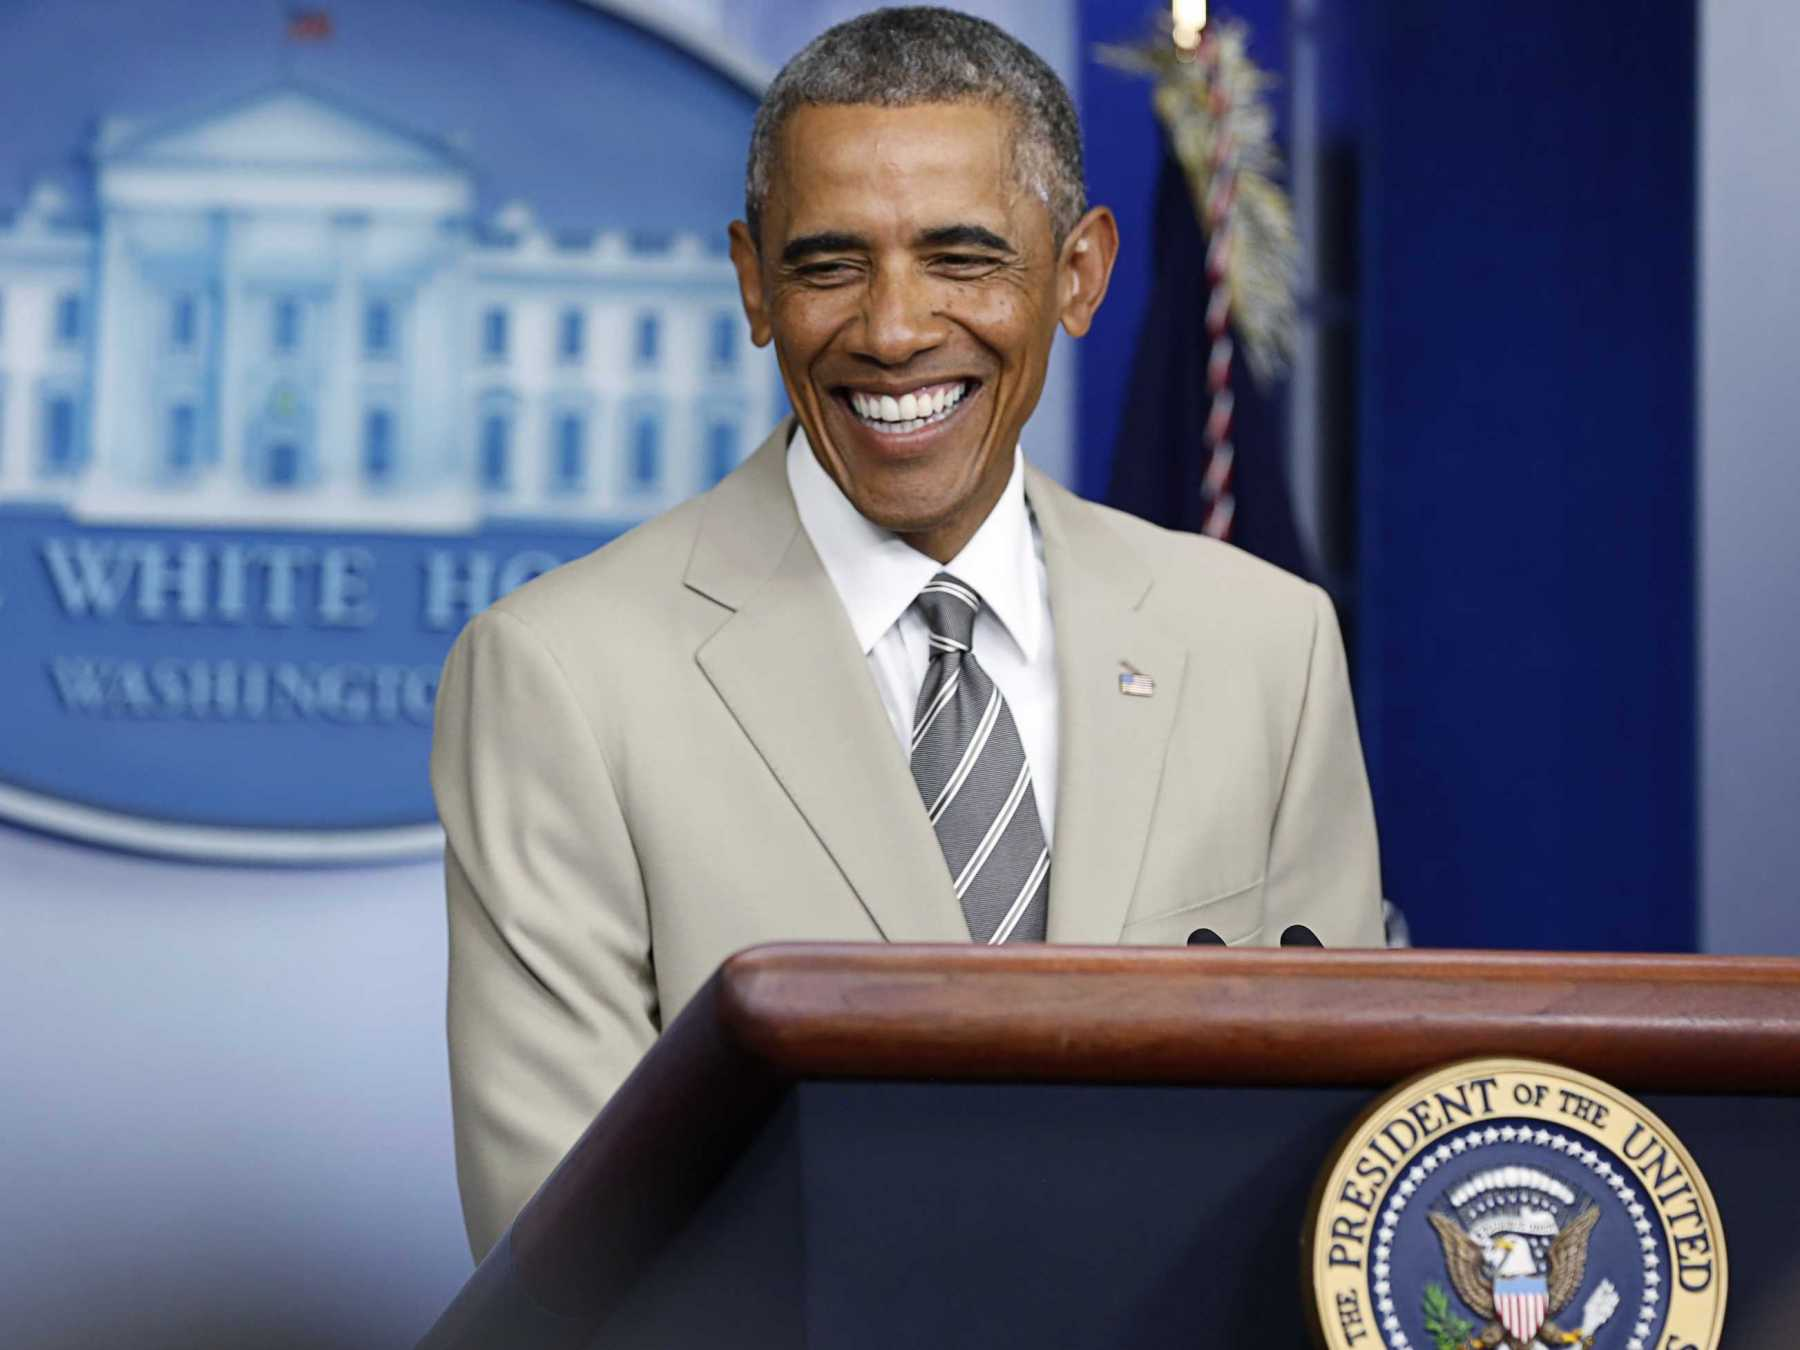 President Barack Obama's